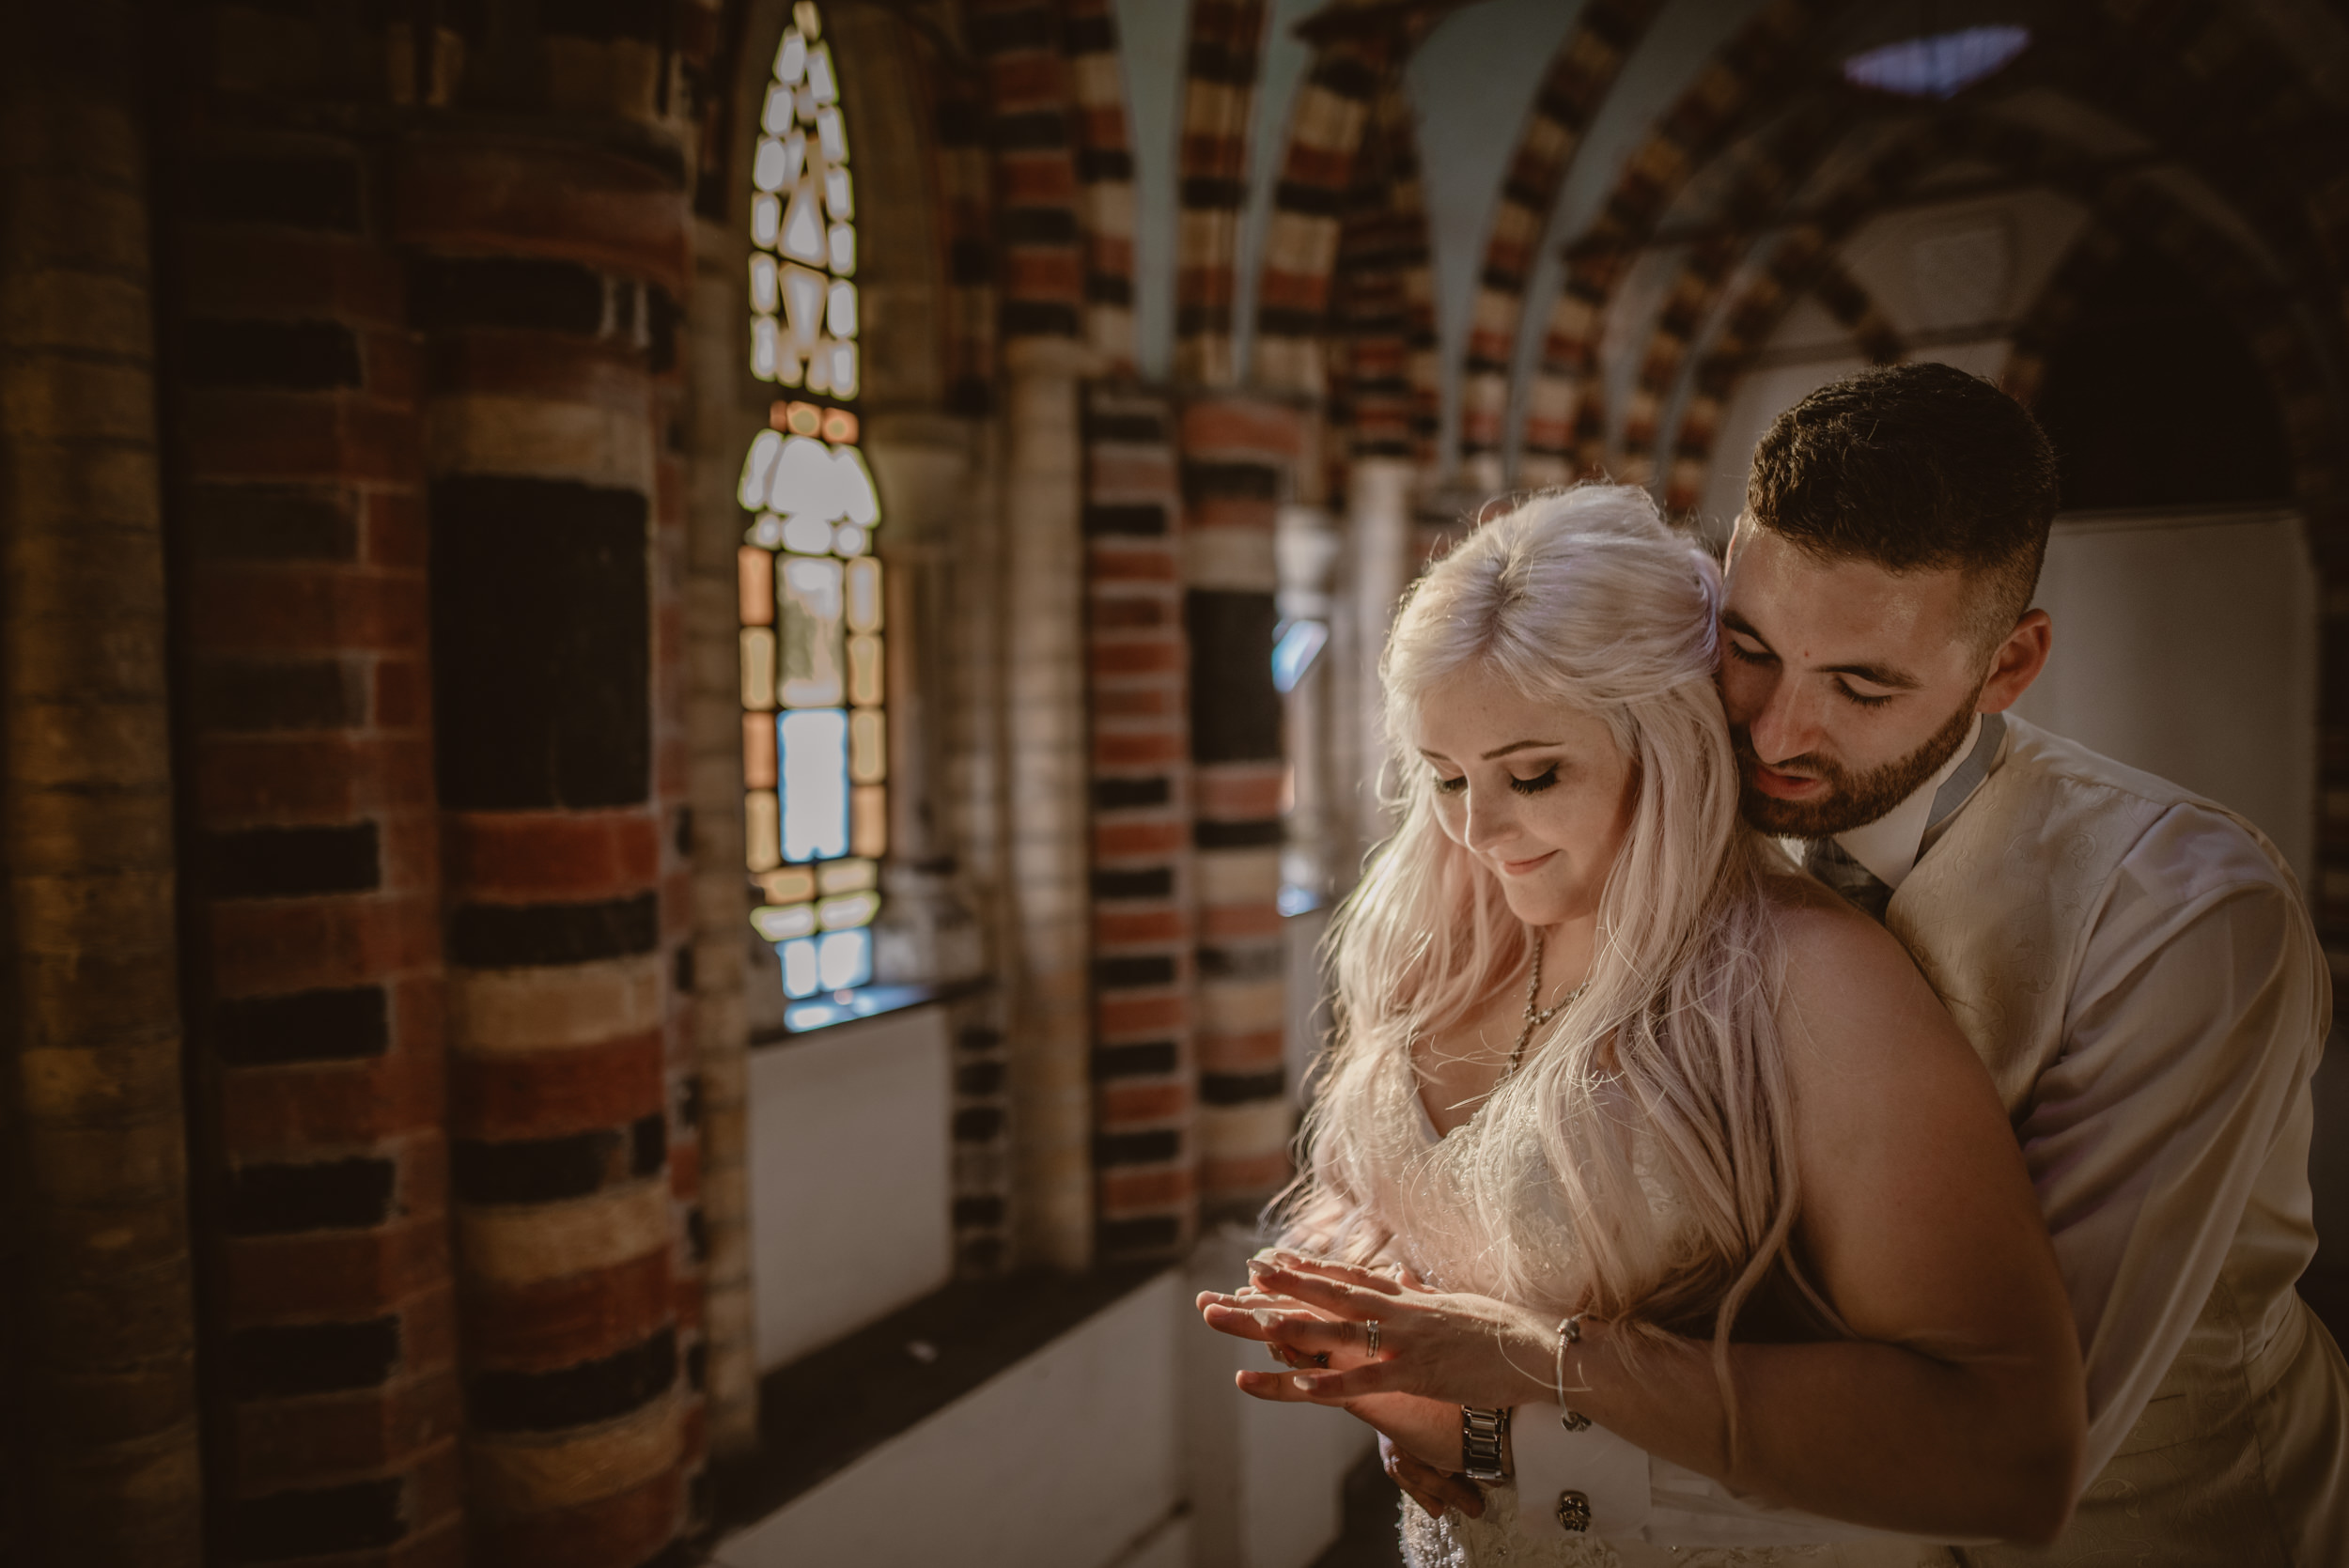 Rachel-and-James-Wedding-Horsley-Towers-State-Manu-Mendoza-Wedding-Photography-486.jpg